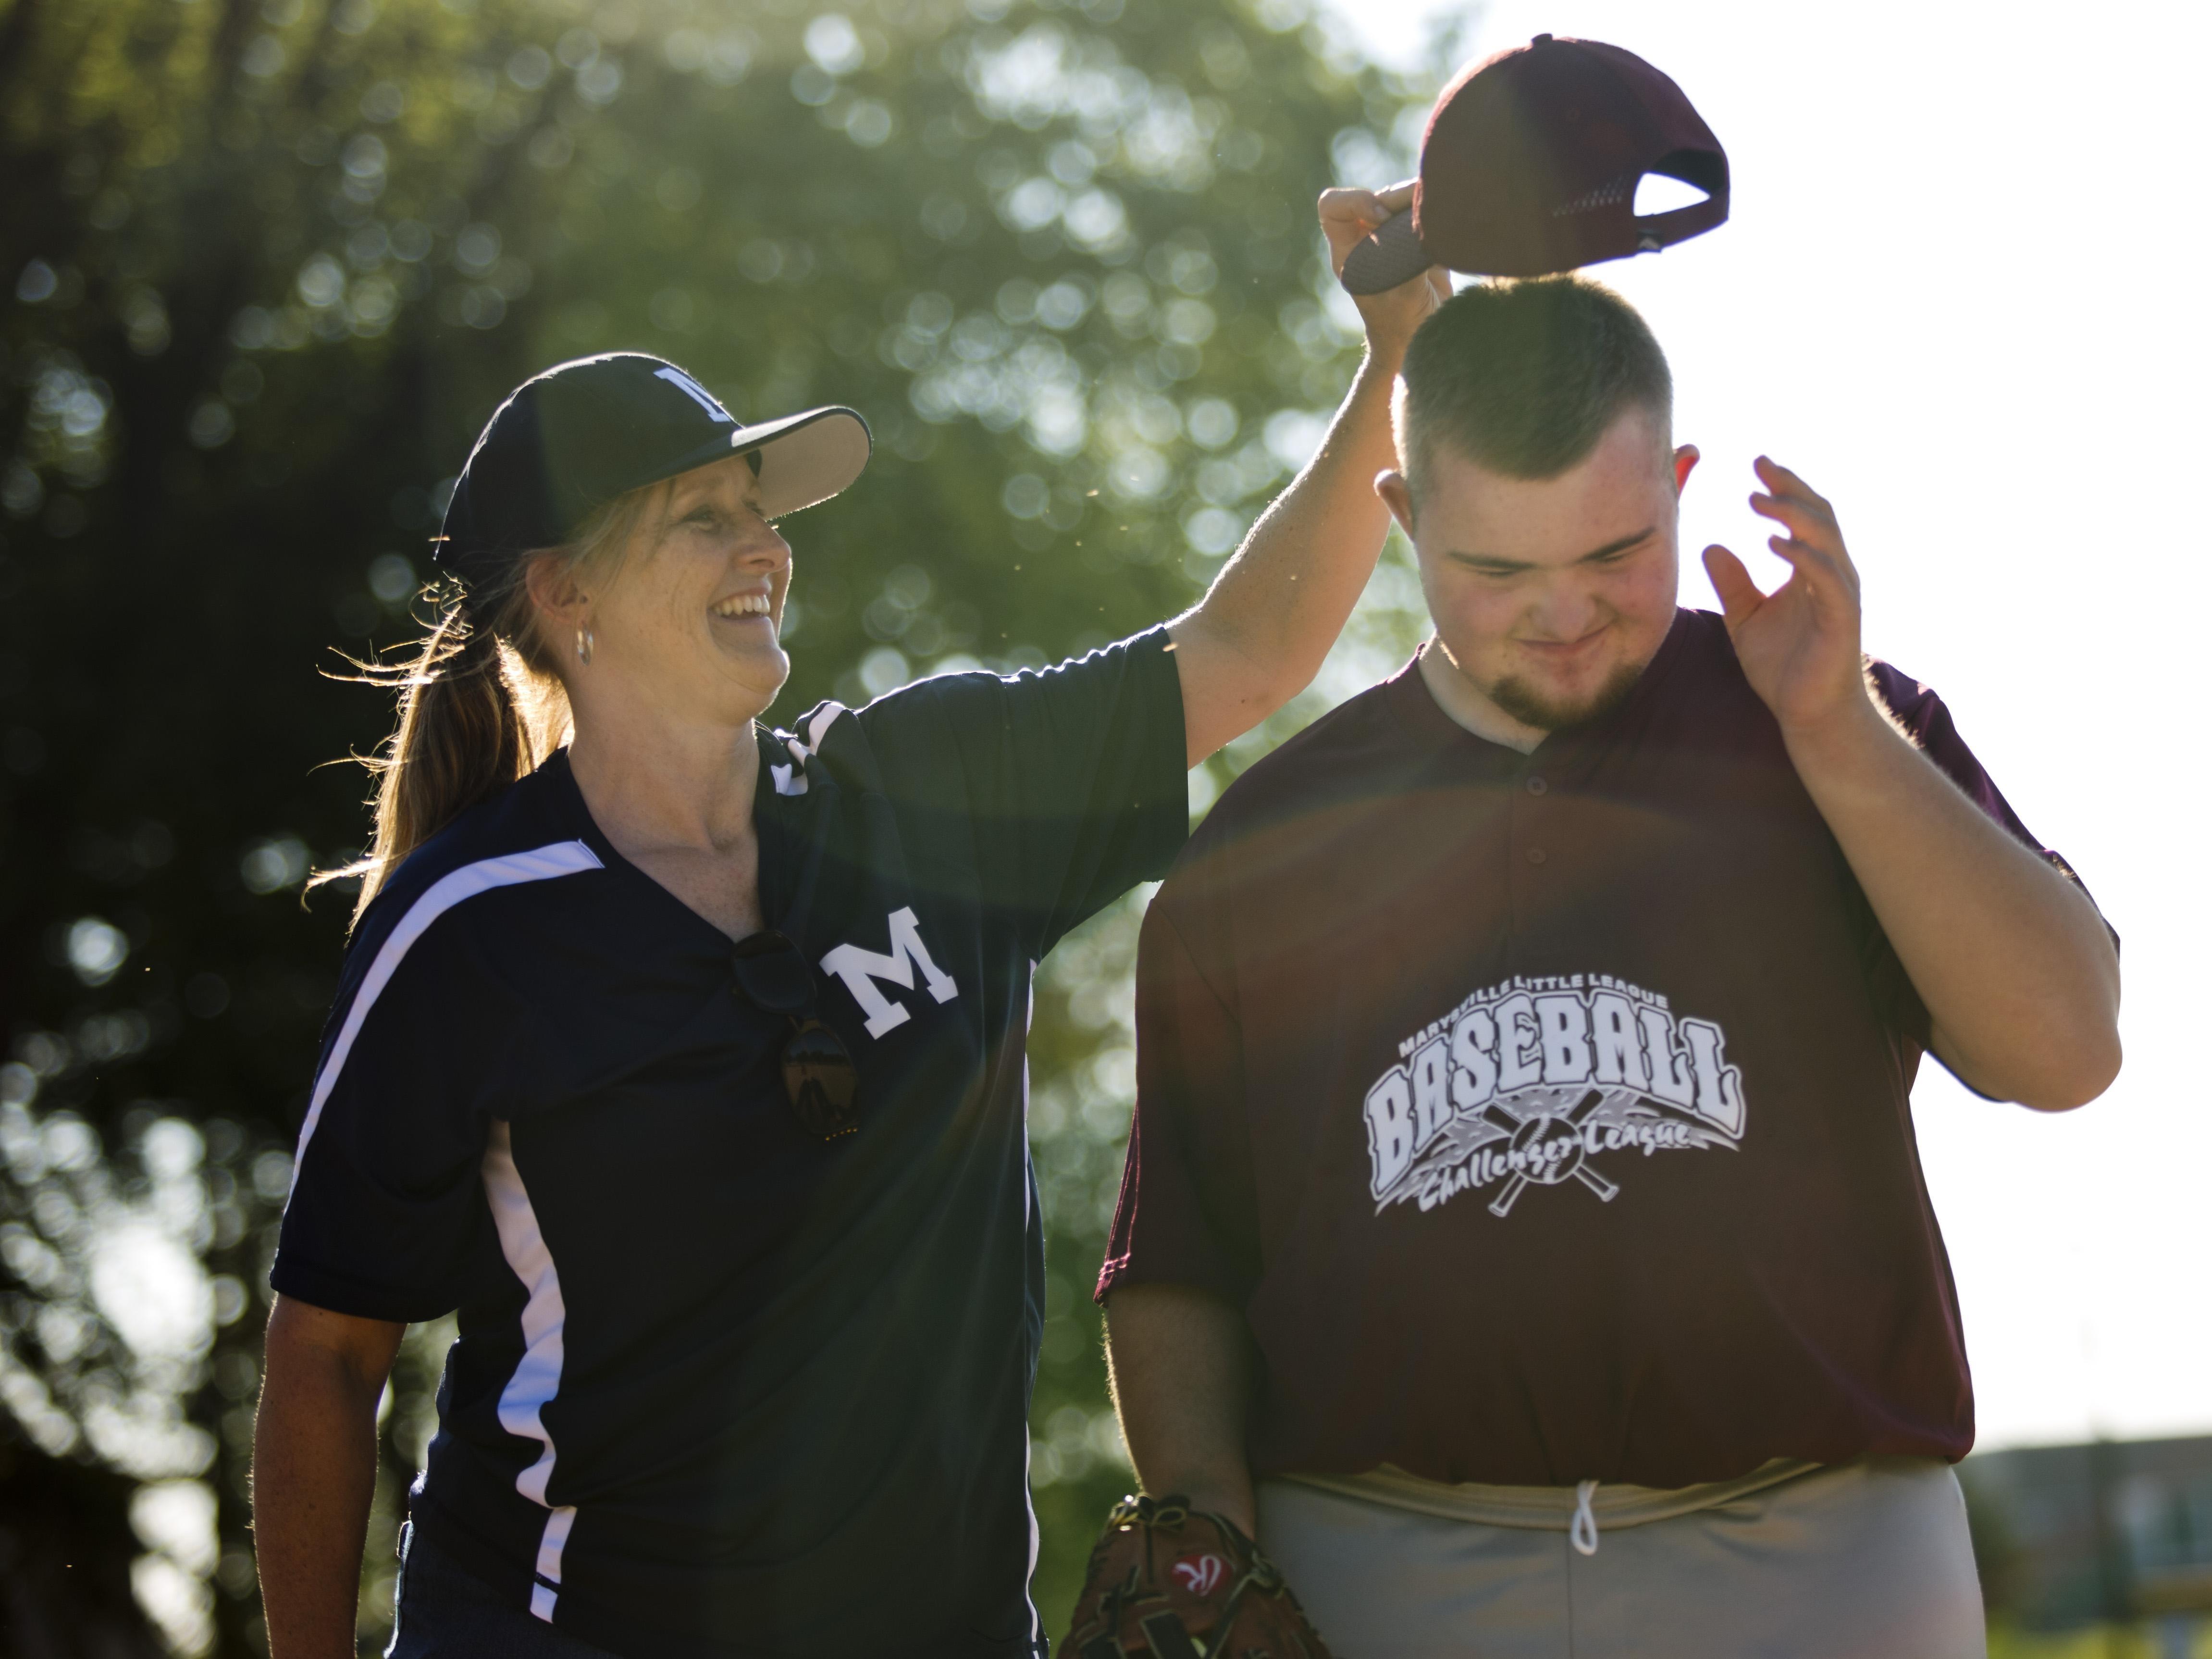 Cheri Weingartz, of Smith's Creek, jokes around with her son Jacob Weingartz during a Marysville Little League Challenger Division baseball game Thursday, July 2, 2015 at Marysville Municipal Park.